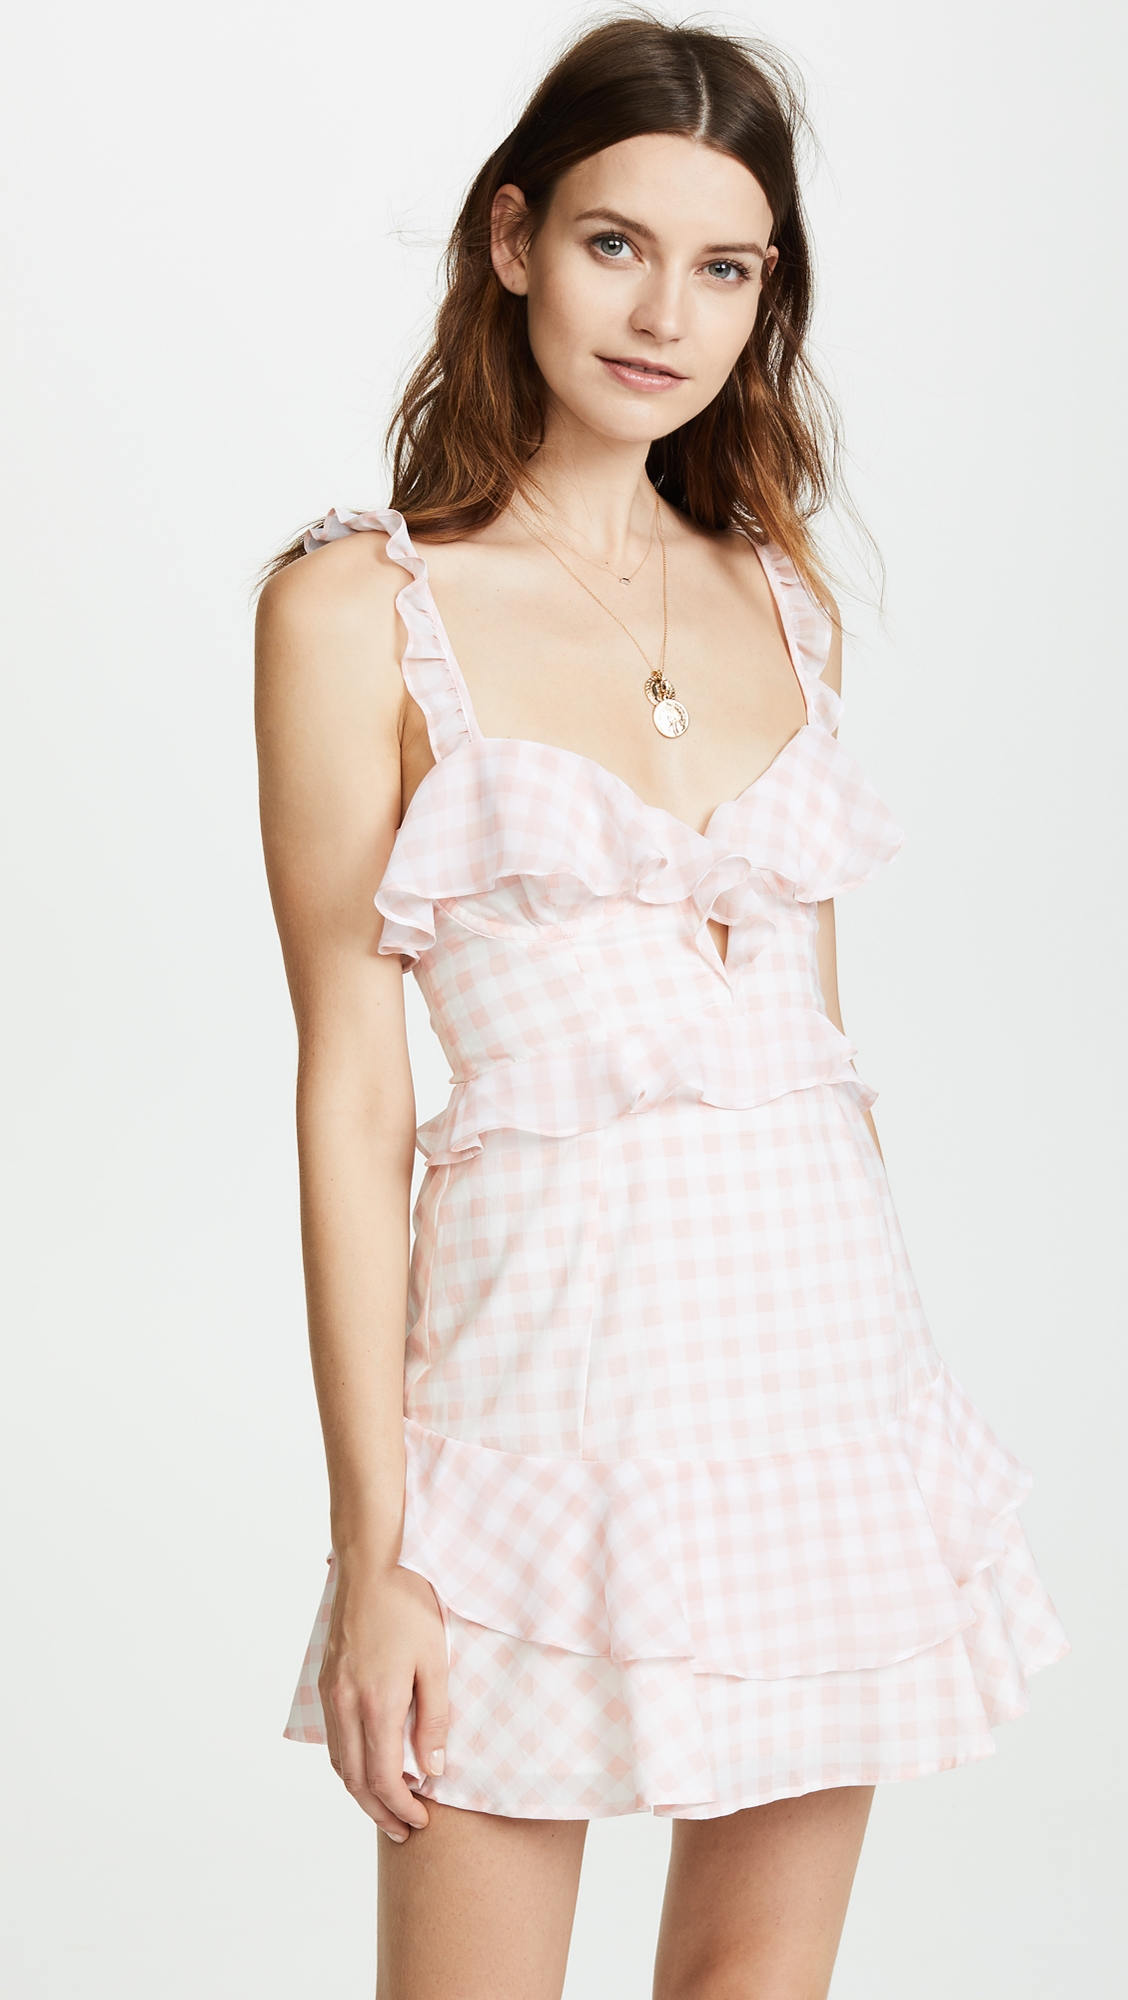 a01da61e2c1d Dixie Ruffled Mini Dress | Products | Pink mini dresses, Dresses ...